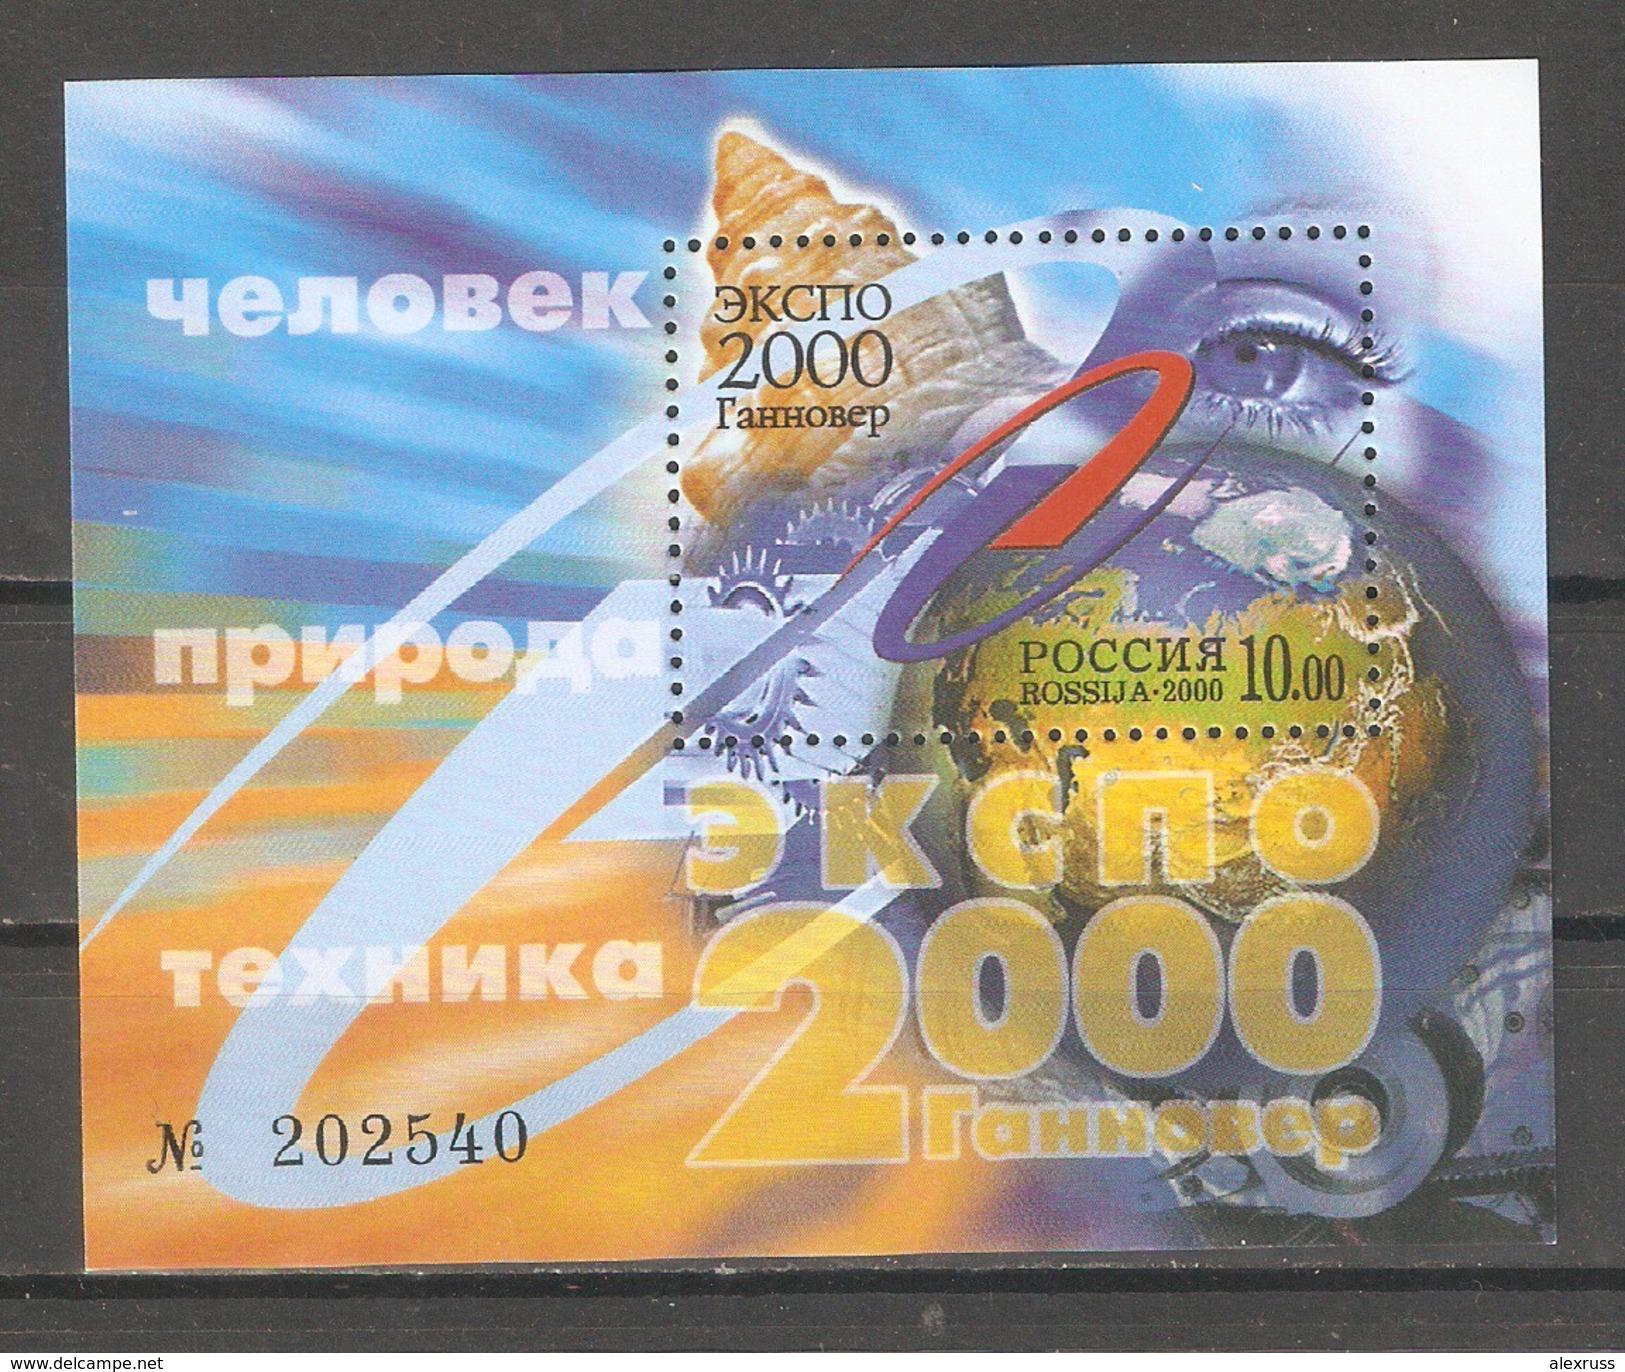 Russia 2000,Souvenir Sheet,EXPO 2000 Hannover,Sc 6590,VF MNH** - 2000 – Hanover (Germany)